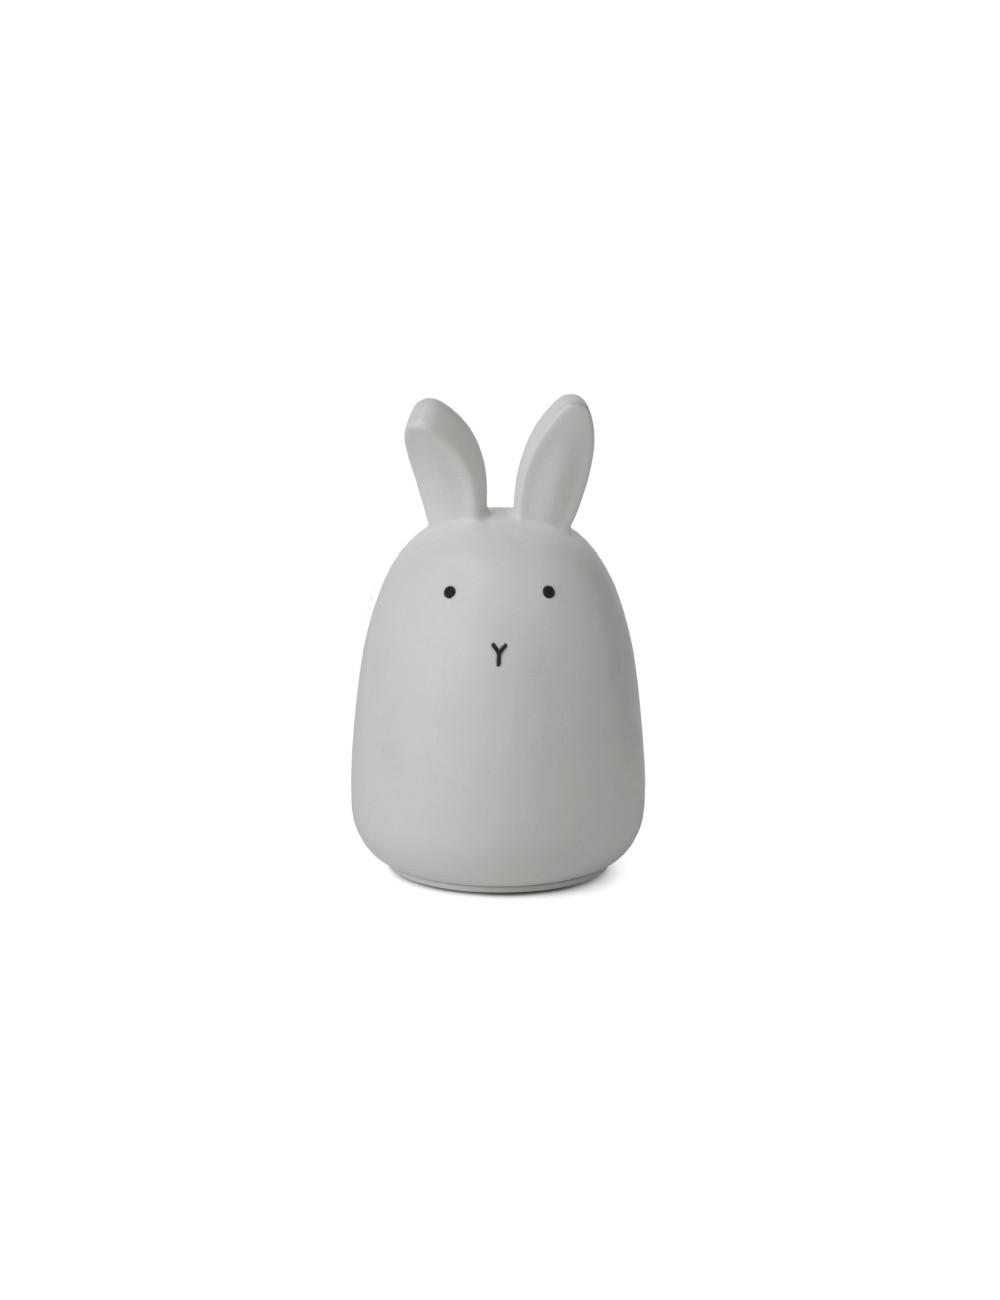 Nachtlampje Winston (oplaadbaar USB)   konijn grijs